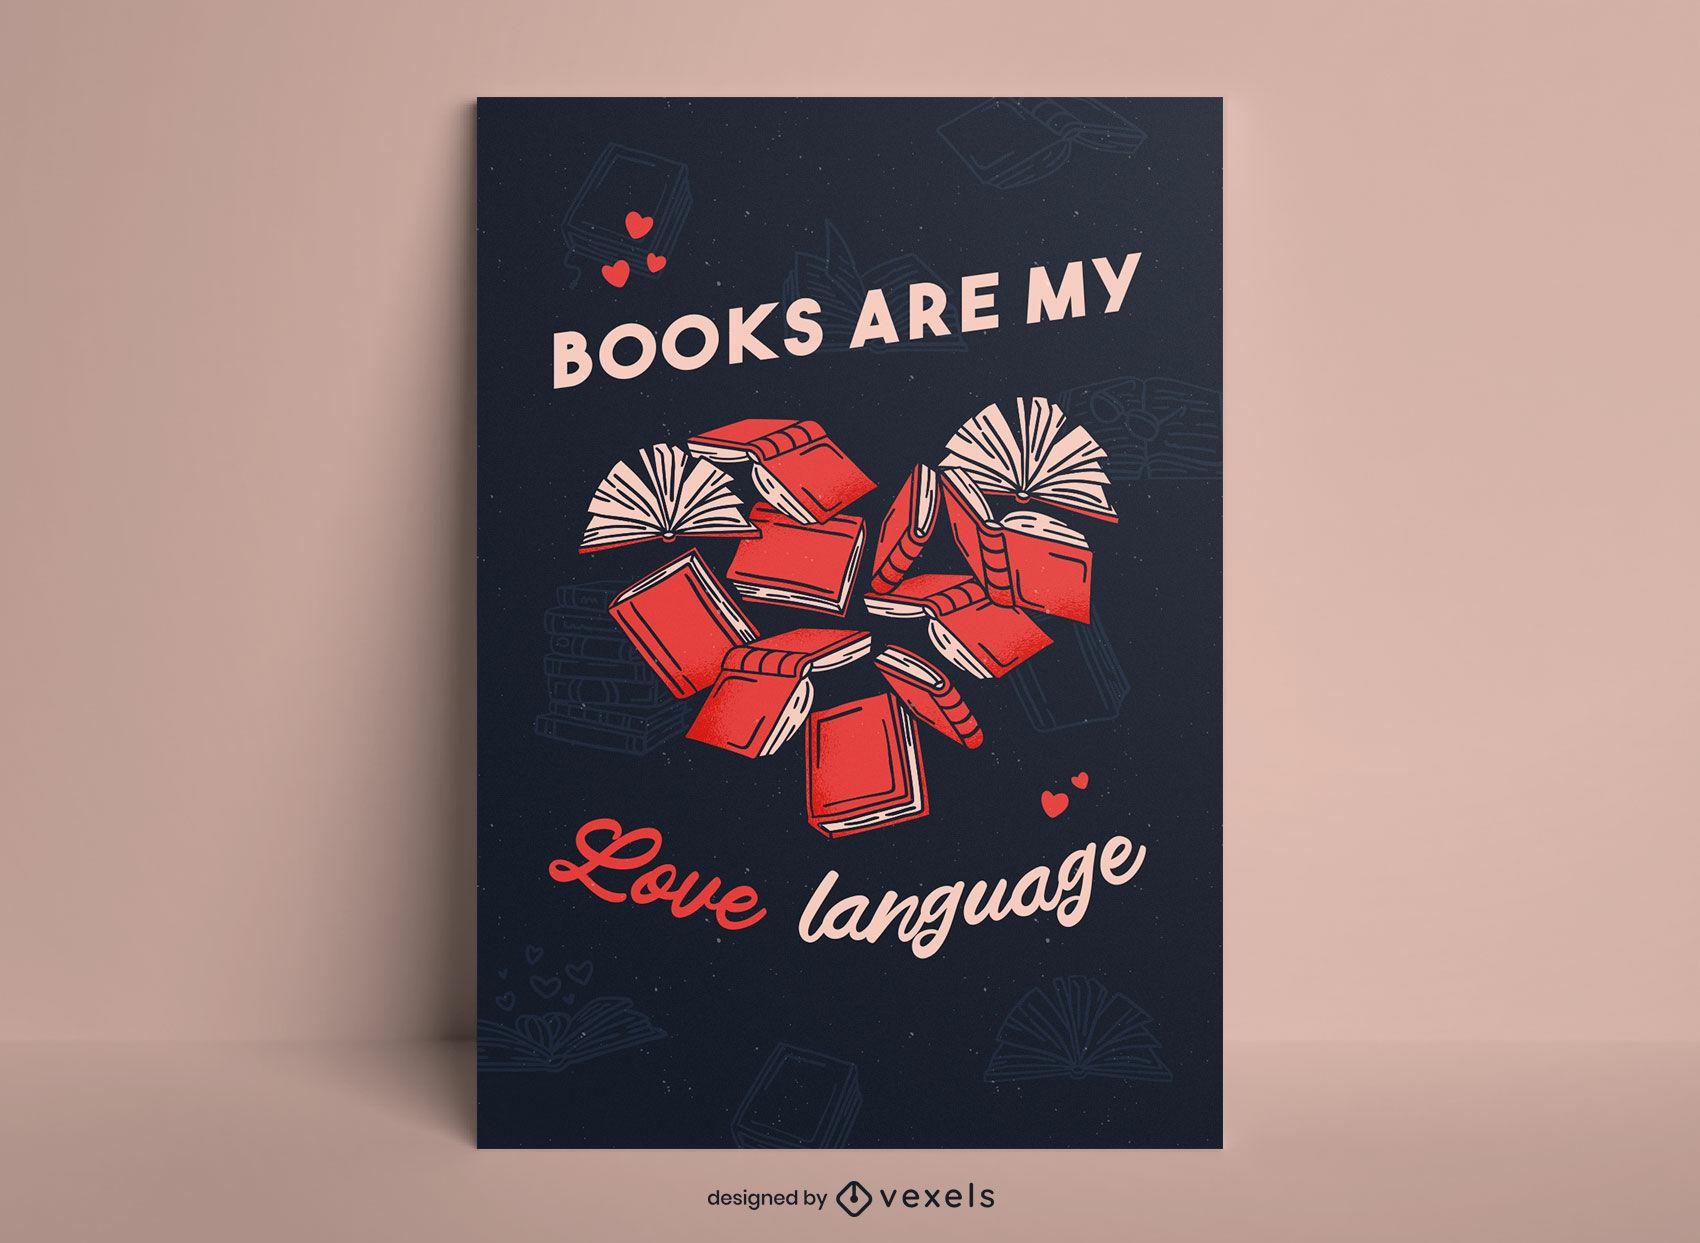 Book shaped heart love poster design